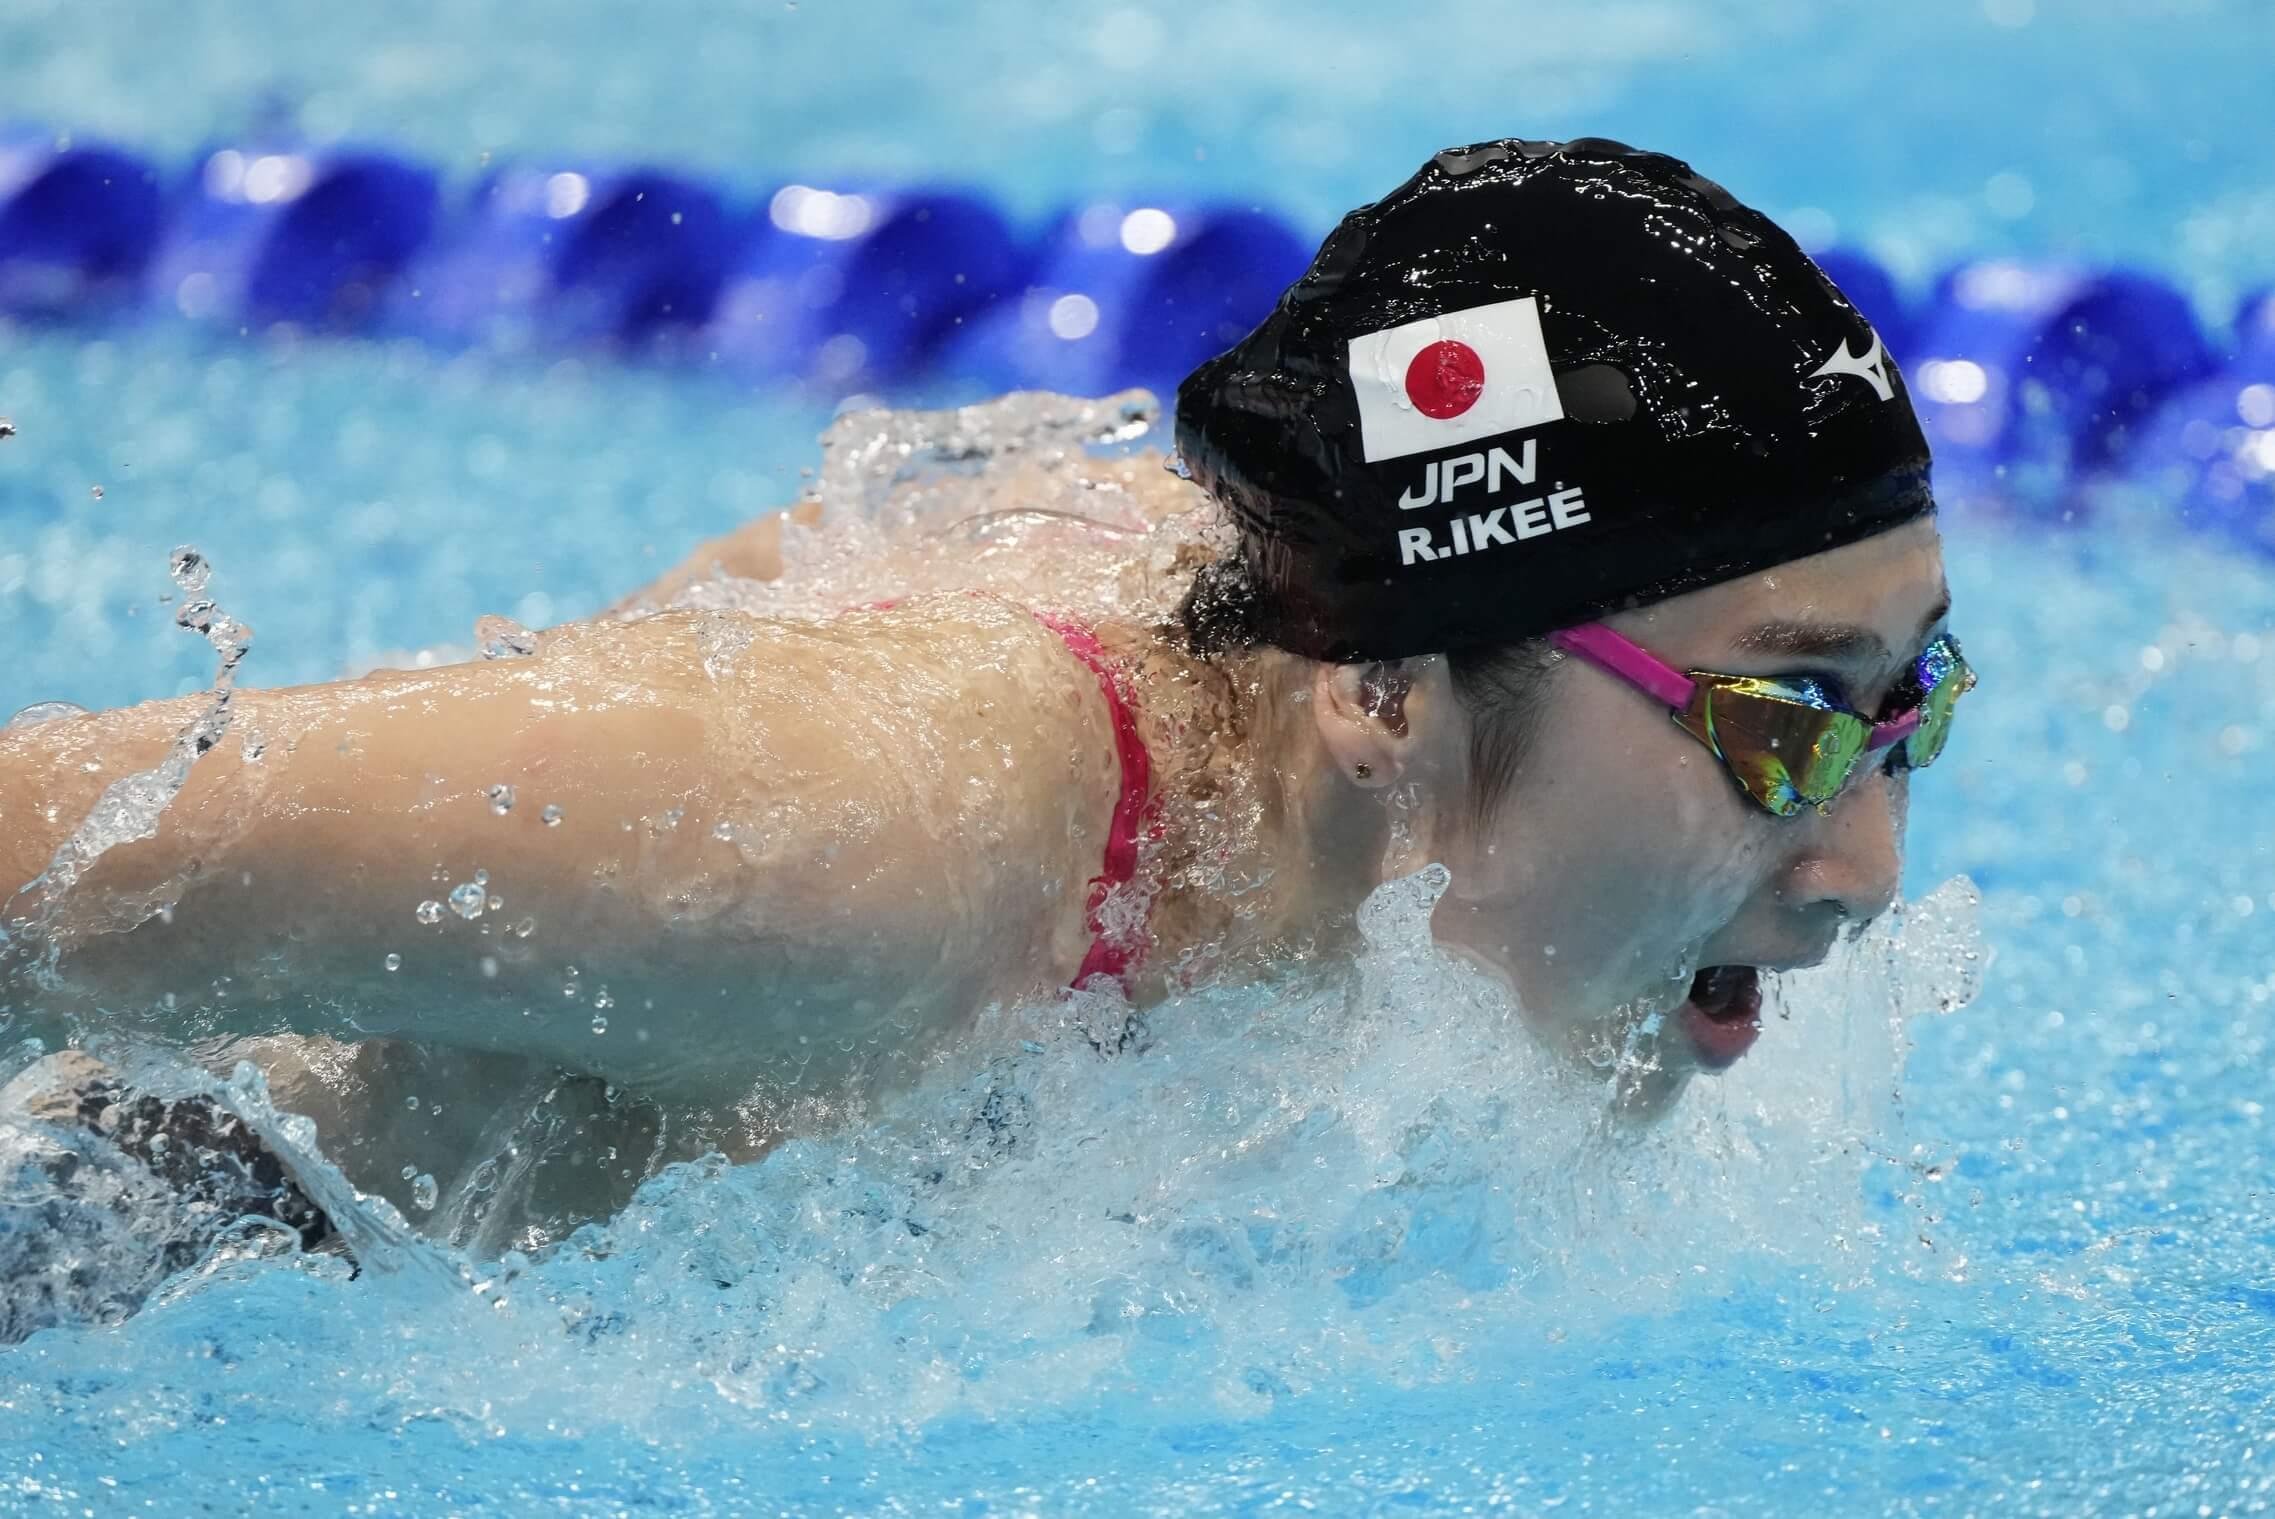 Jul 30, 2021; Tokyo, Japan; Rikako Ikee (JPN) in the women's 4x100m medley heats during the Tokyo 2020 Olympic Summer Games at Tokyo Aquatics Centre. Mandatory Credit: Rob Schumacher-USA TODAY Sports